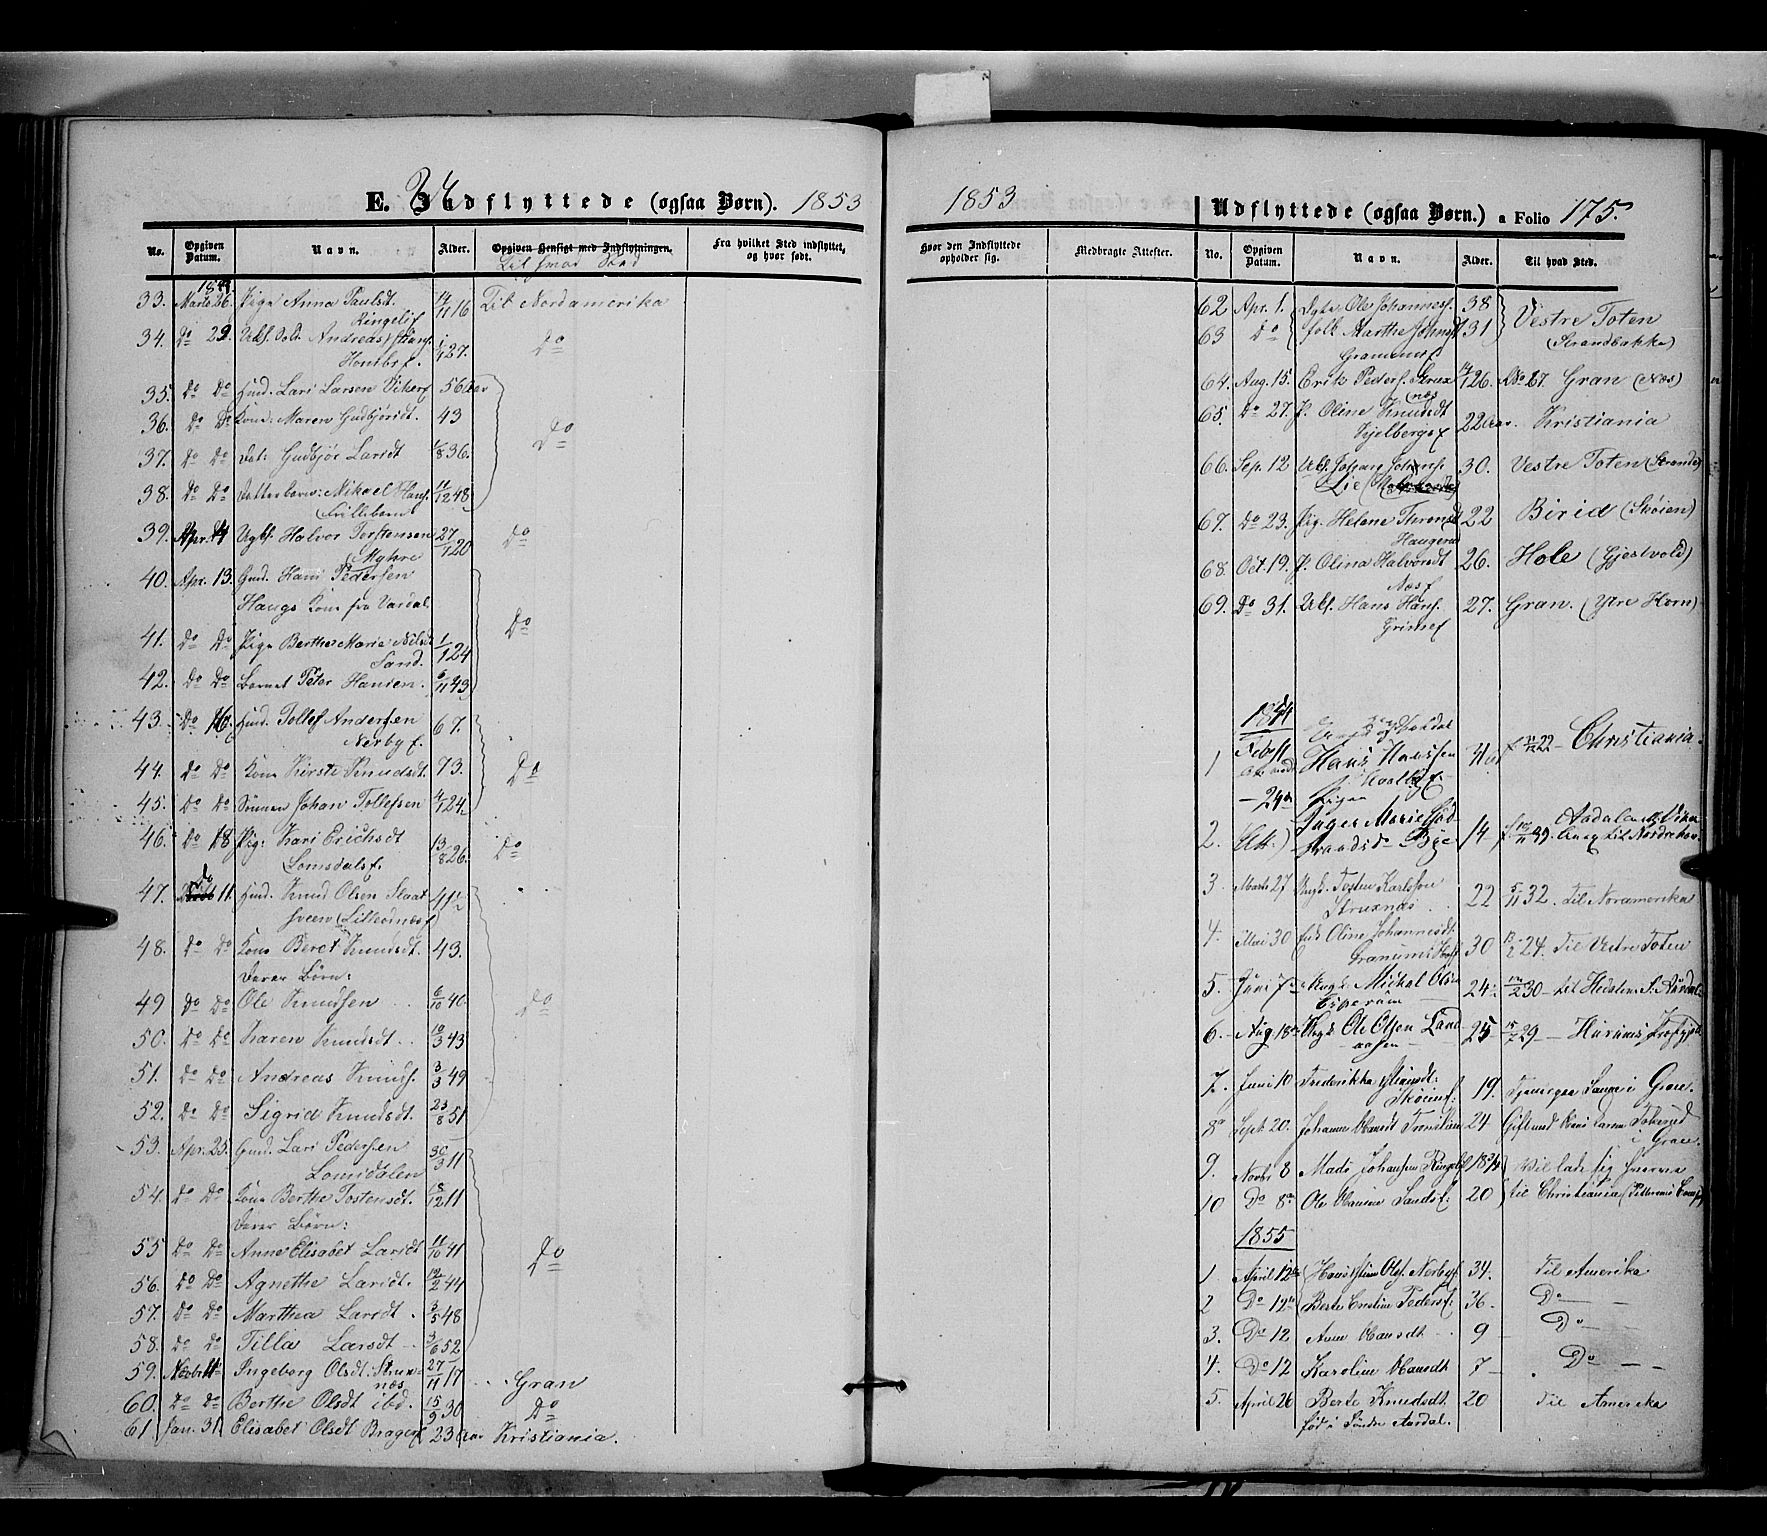 SAH, Land prestekontor, Ministerialbok nr. 9, 1847-1859, s. 175